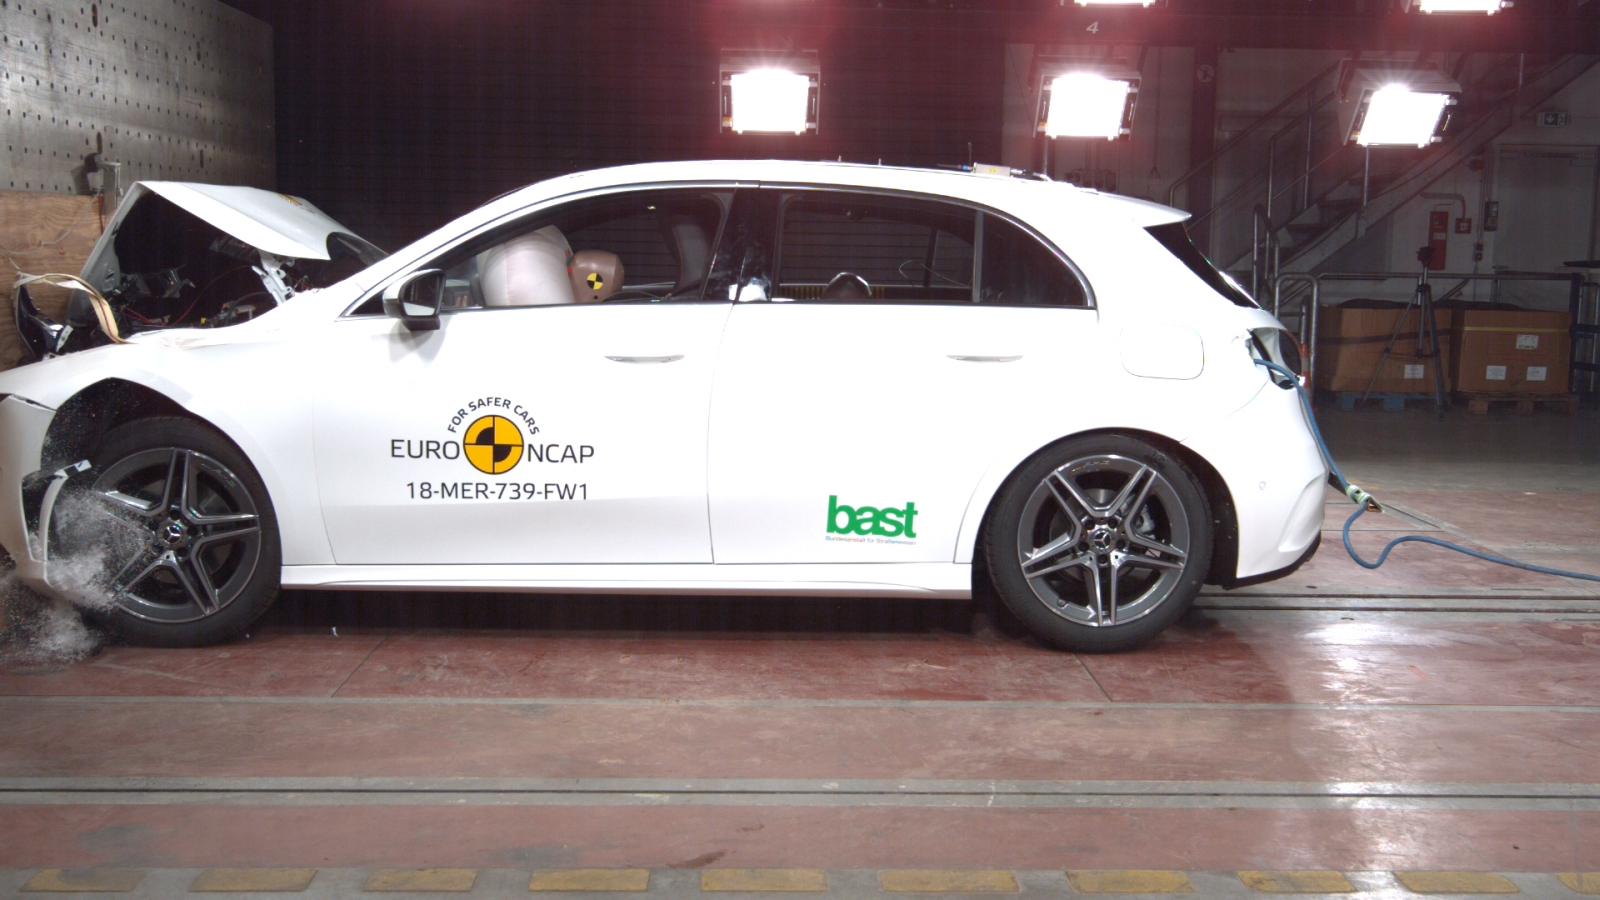 Euro NCAP 2018 Best in class